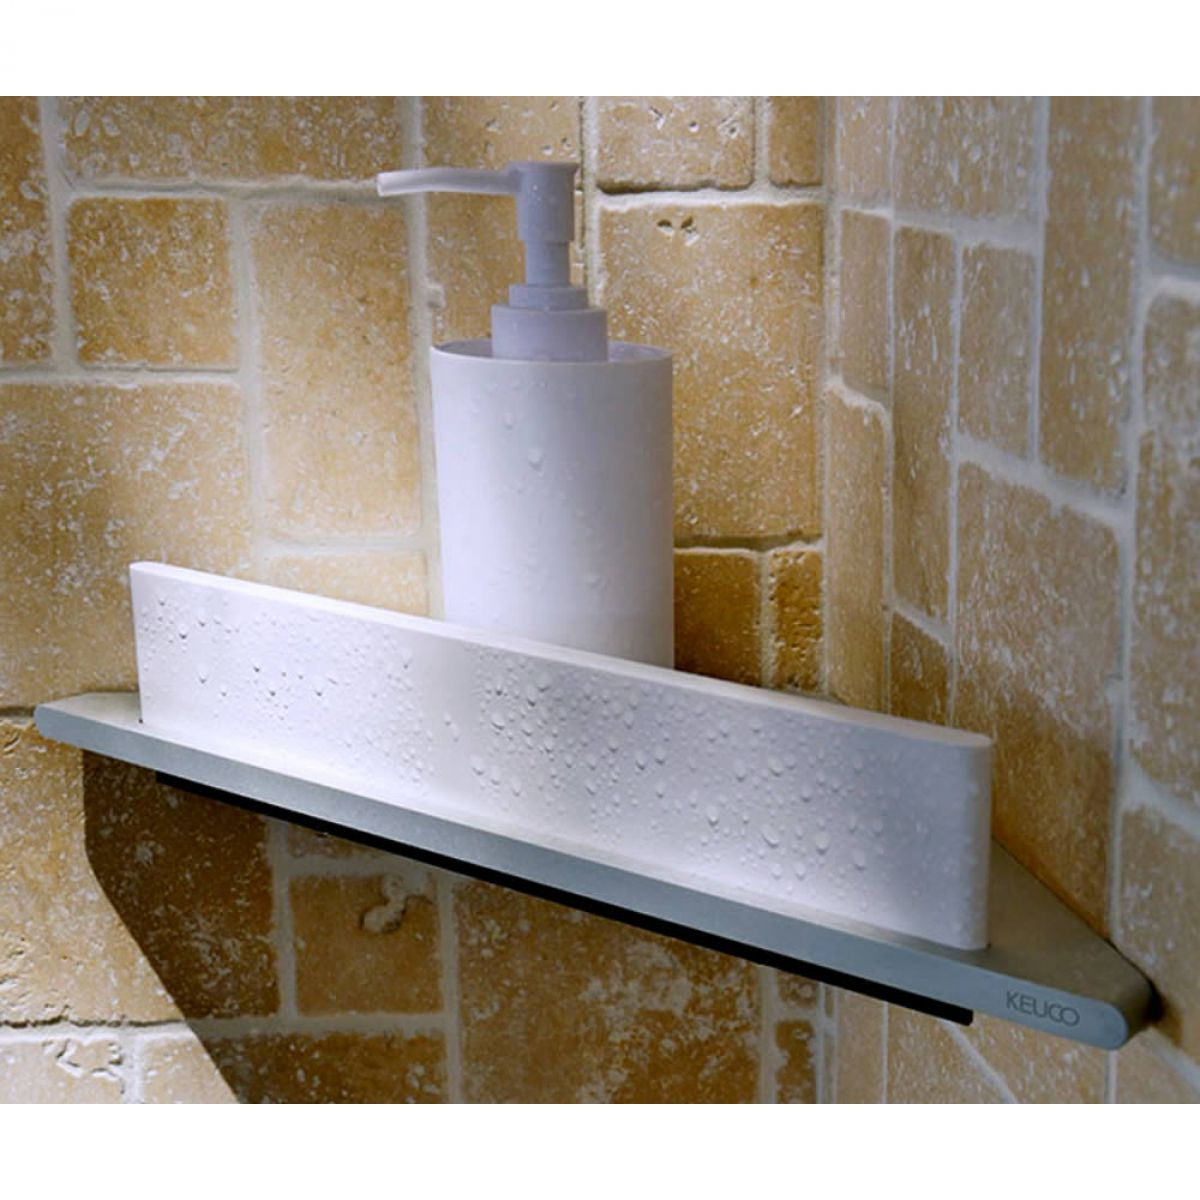 Keuco Edition 400 Corner Shower Shelf with Integrated